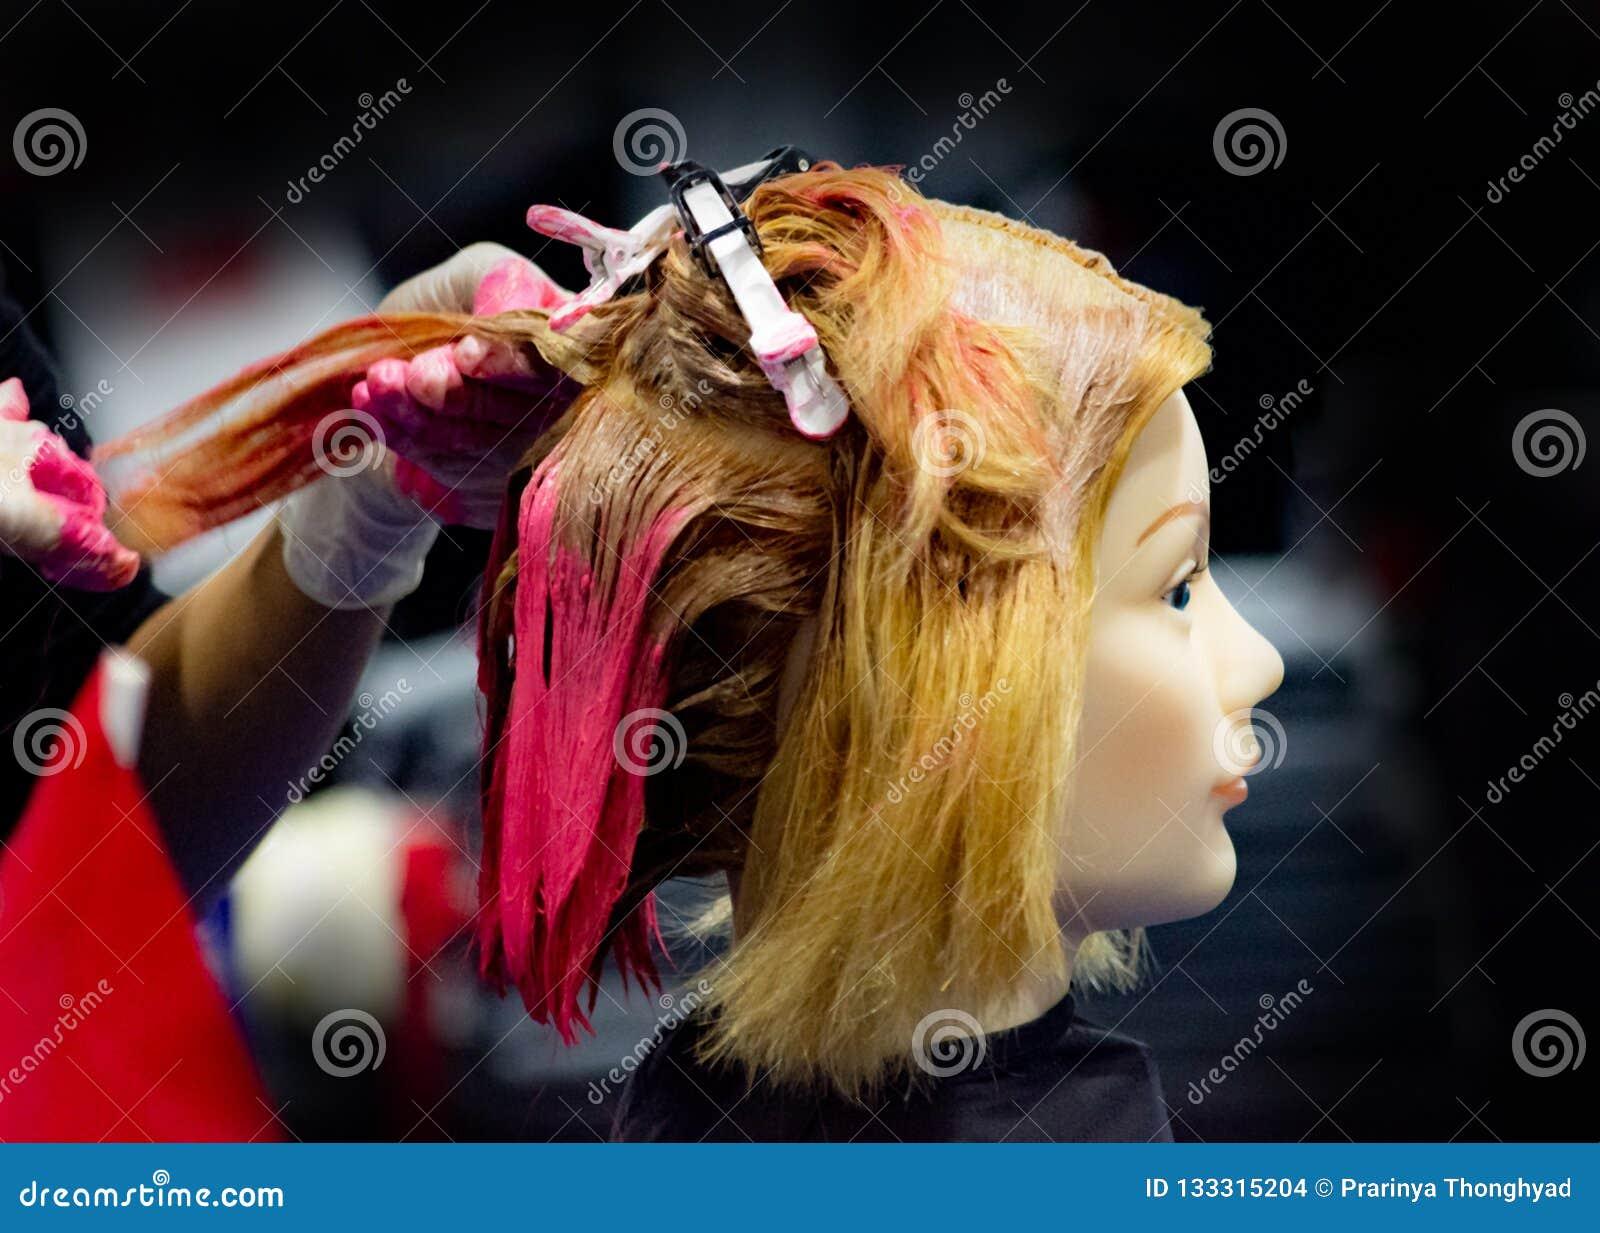 Hairstyles on dummy head of hair salon